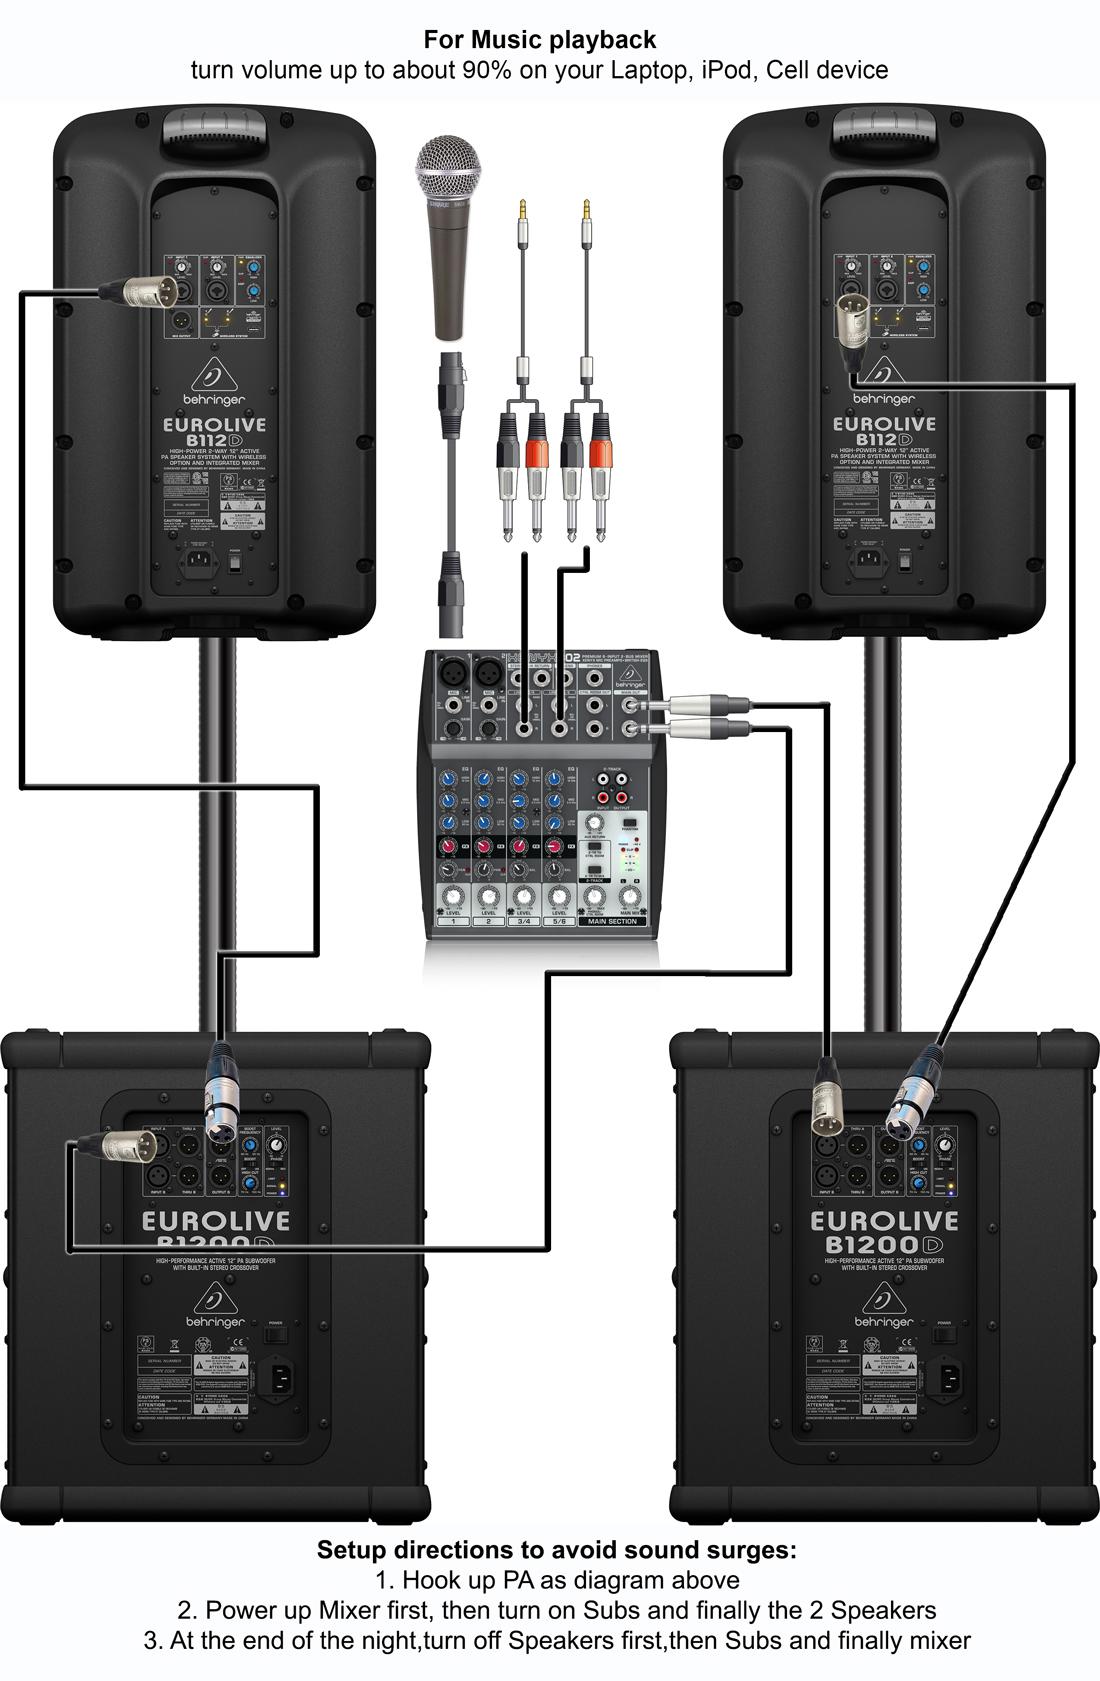 pa setup diagram kawasaki bayou 250 carburetor wedding rentals abbotsford rent sound systems dj